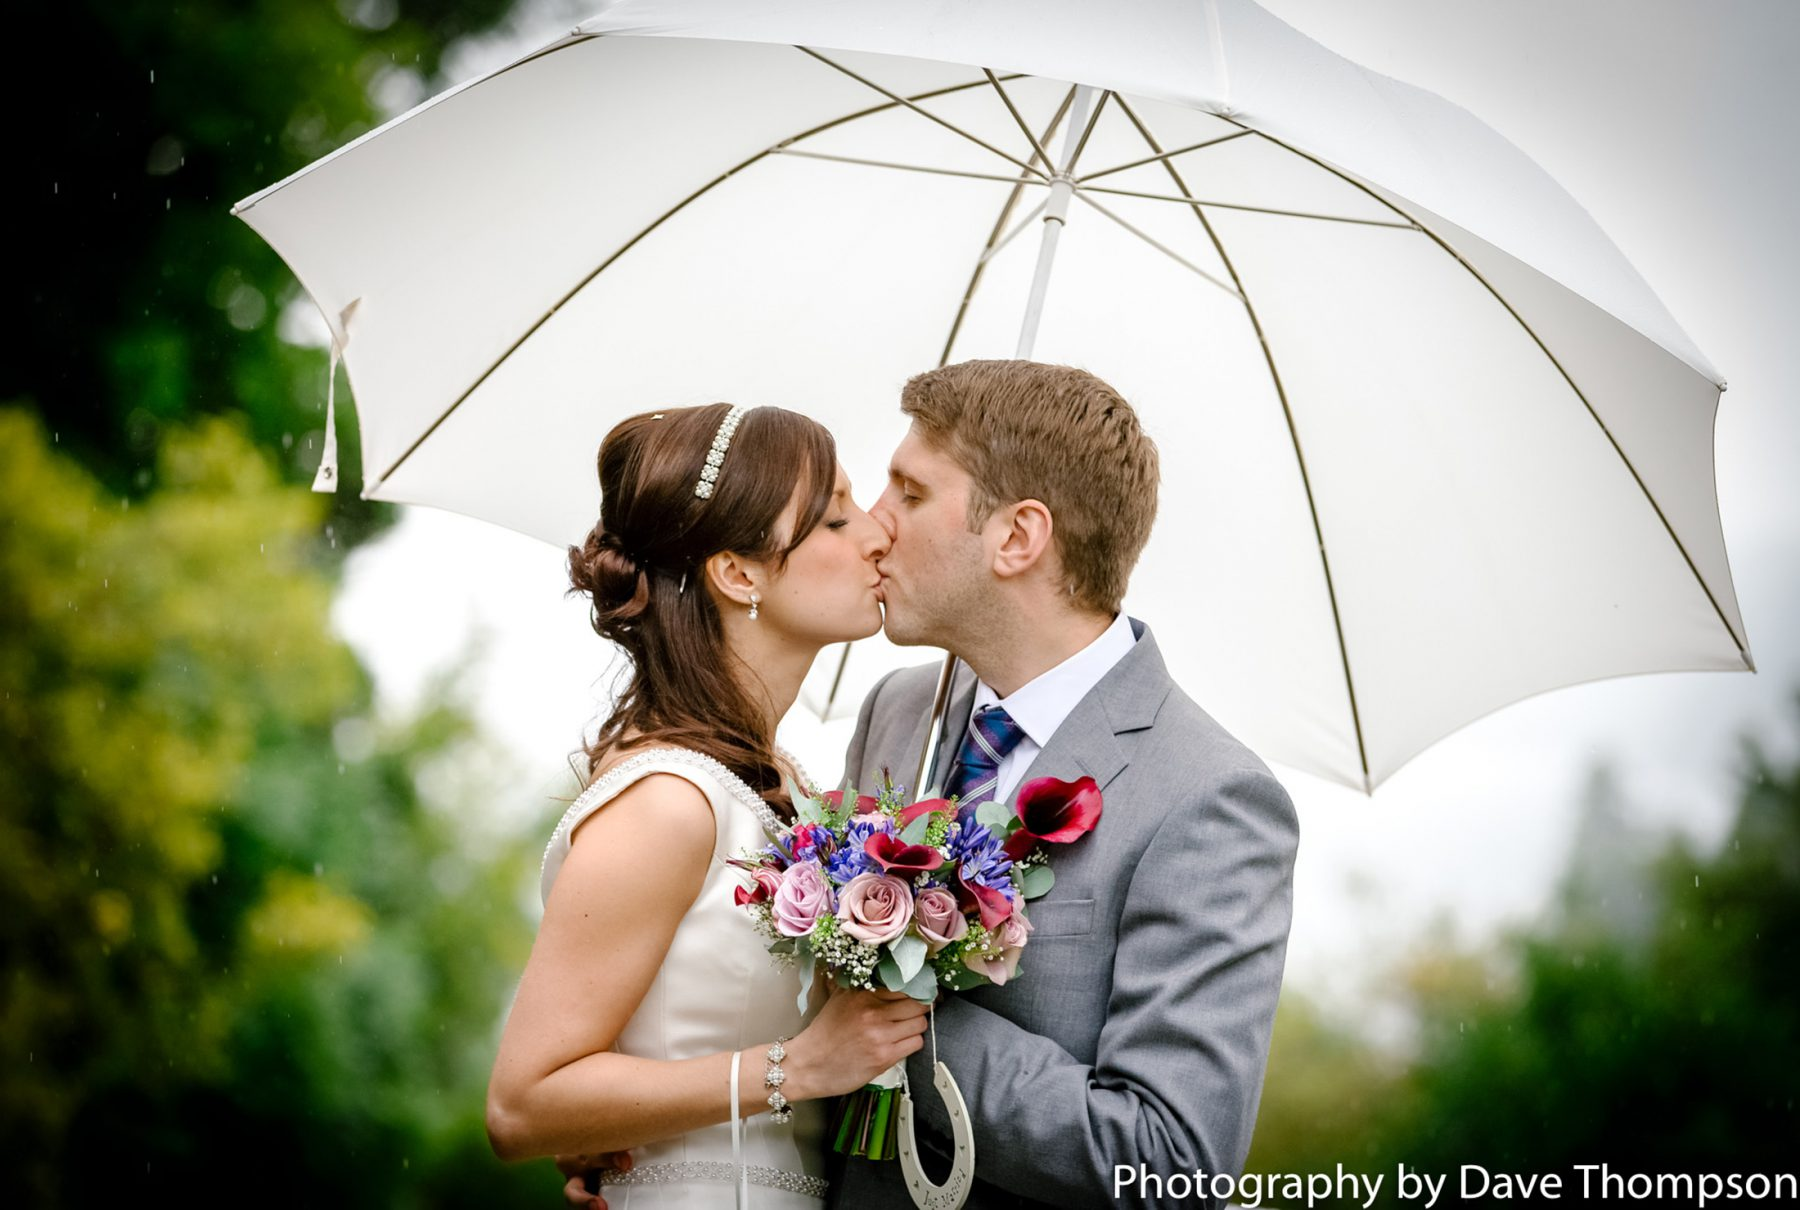 Bride and groom beneath an umbrella